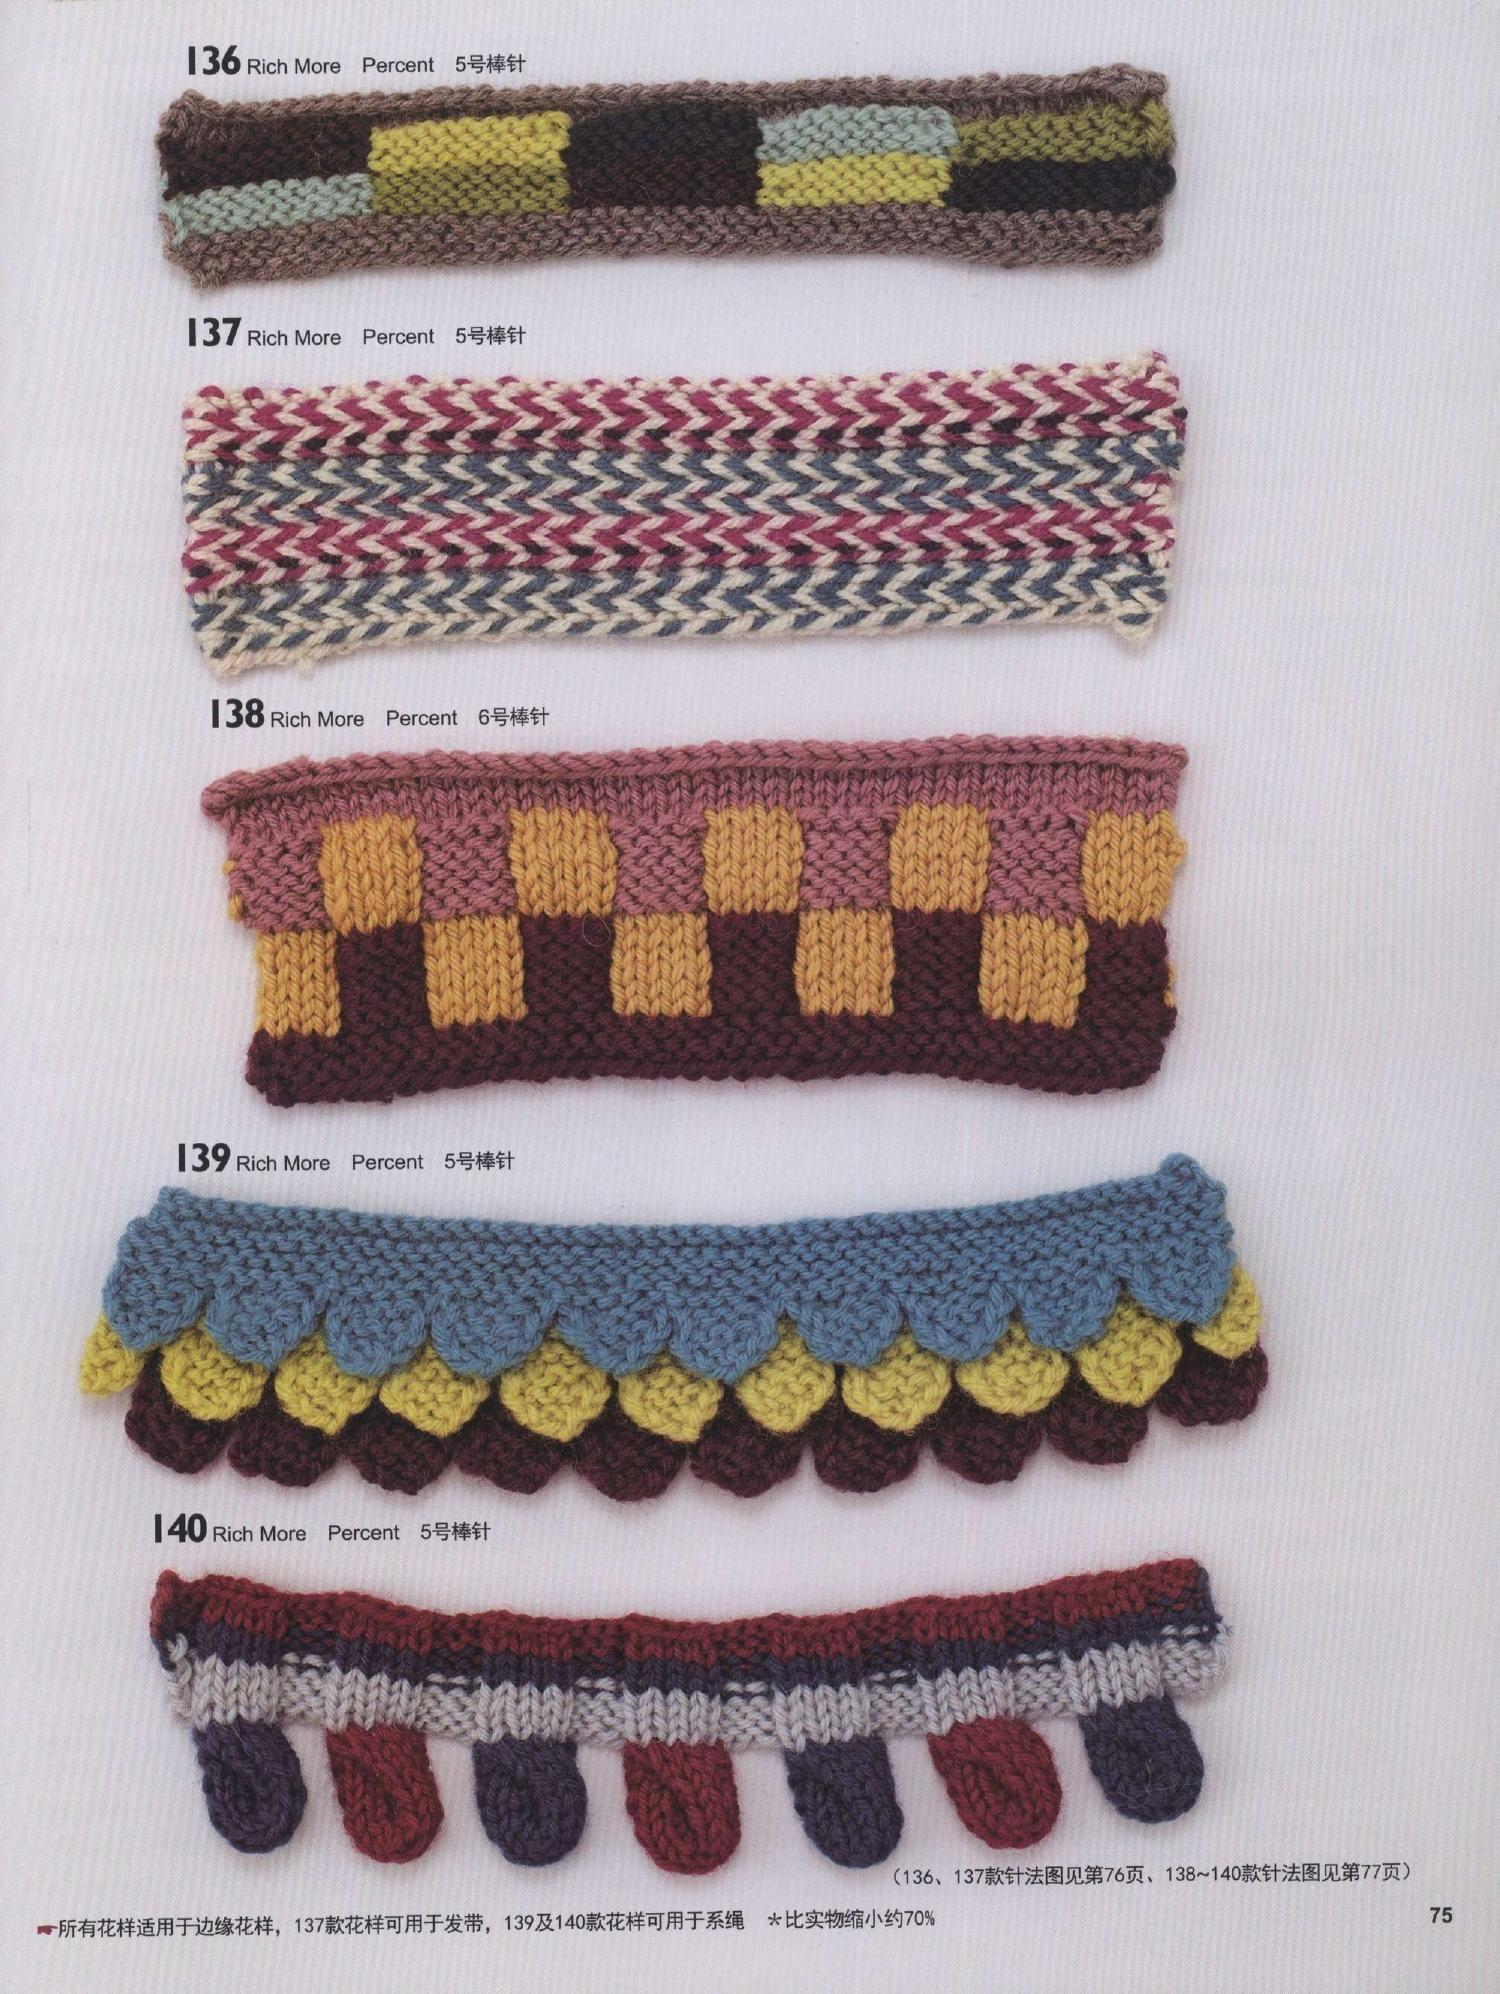 150_Knitting_Patterns_76.jpg